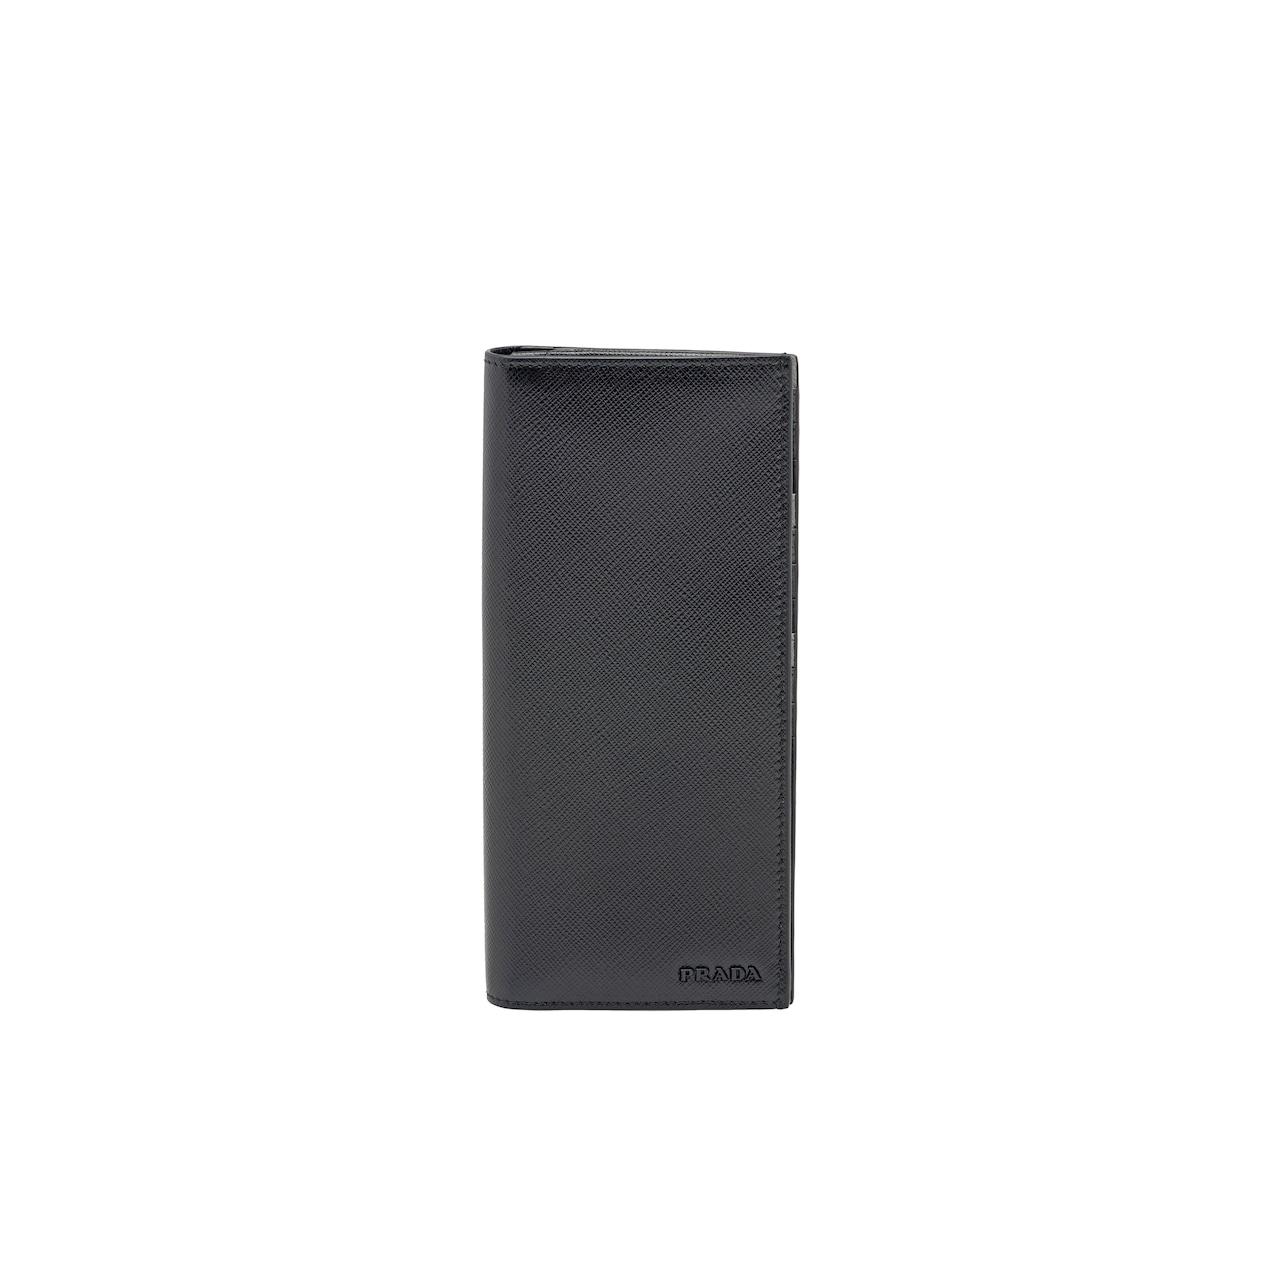 Prada Saffiano leather wallet 1